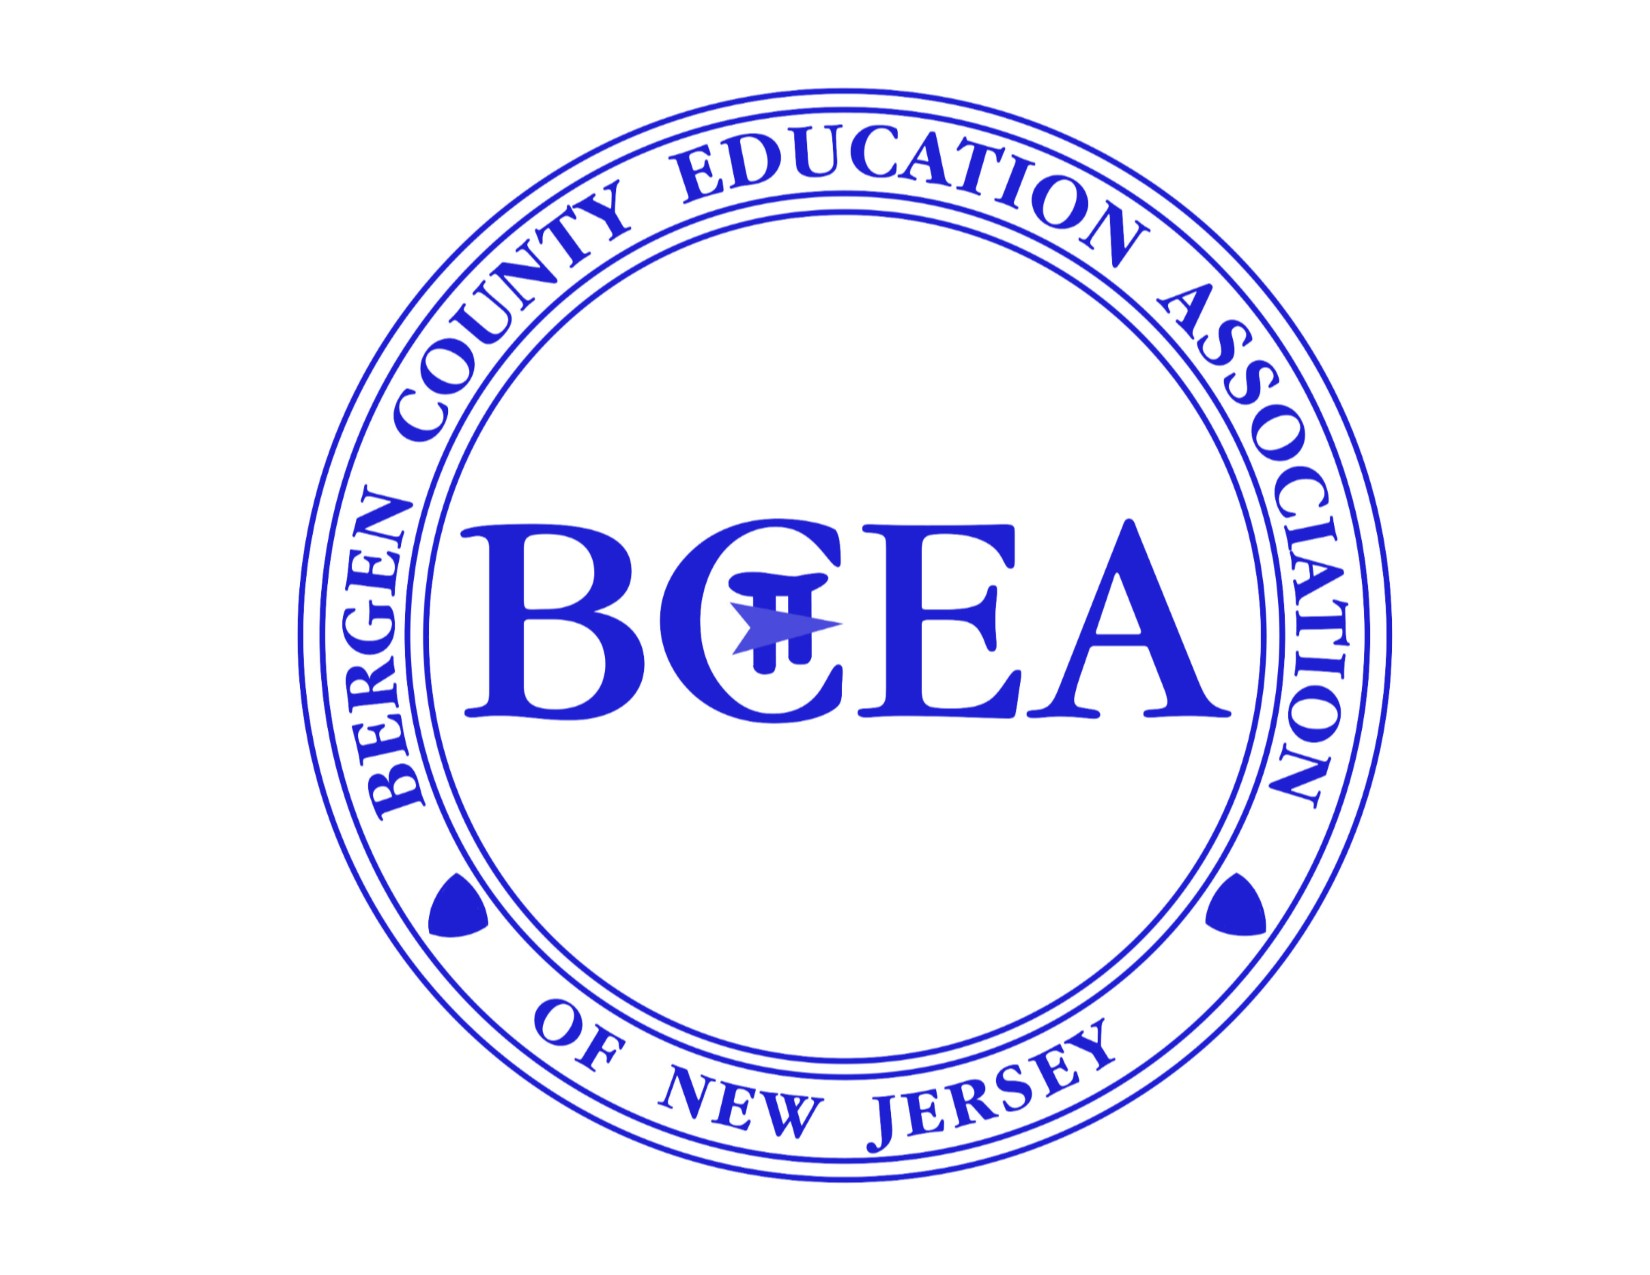 Bergen County Education Association